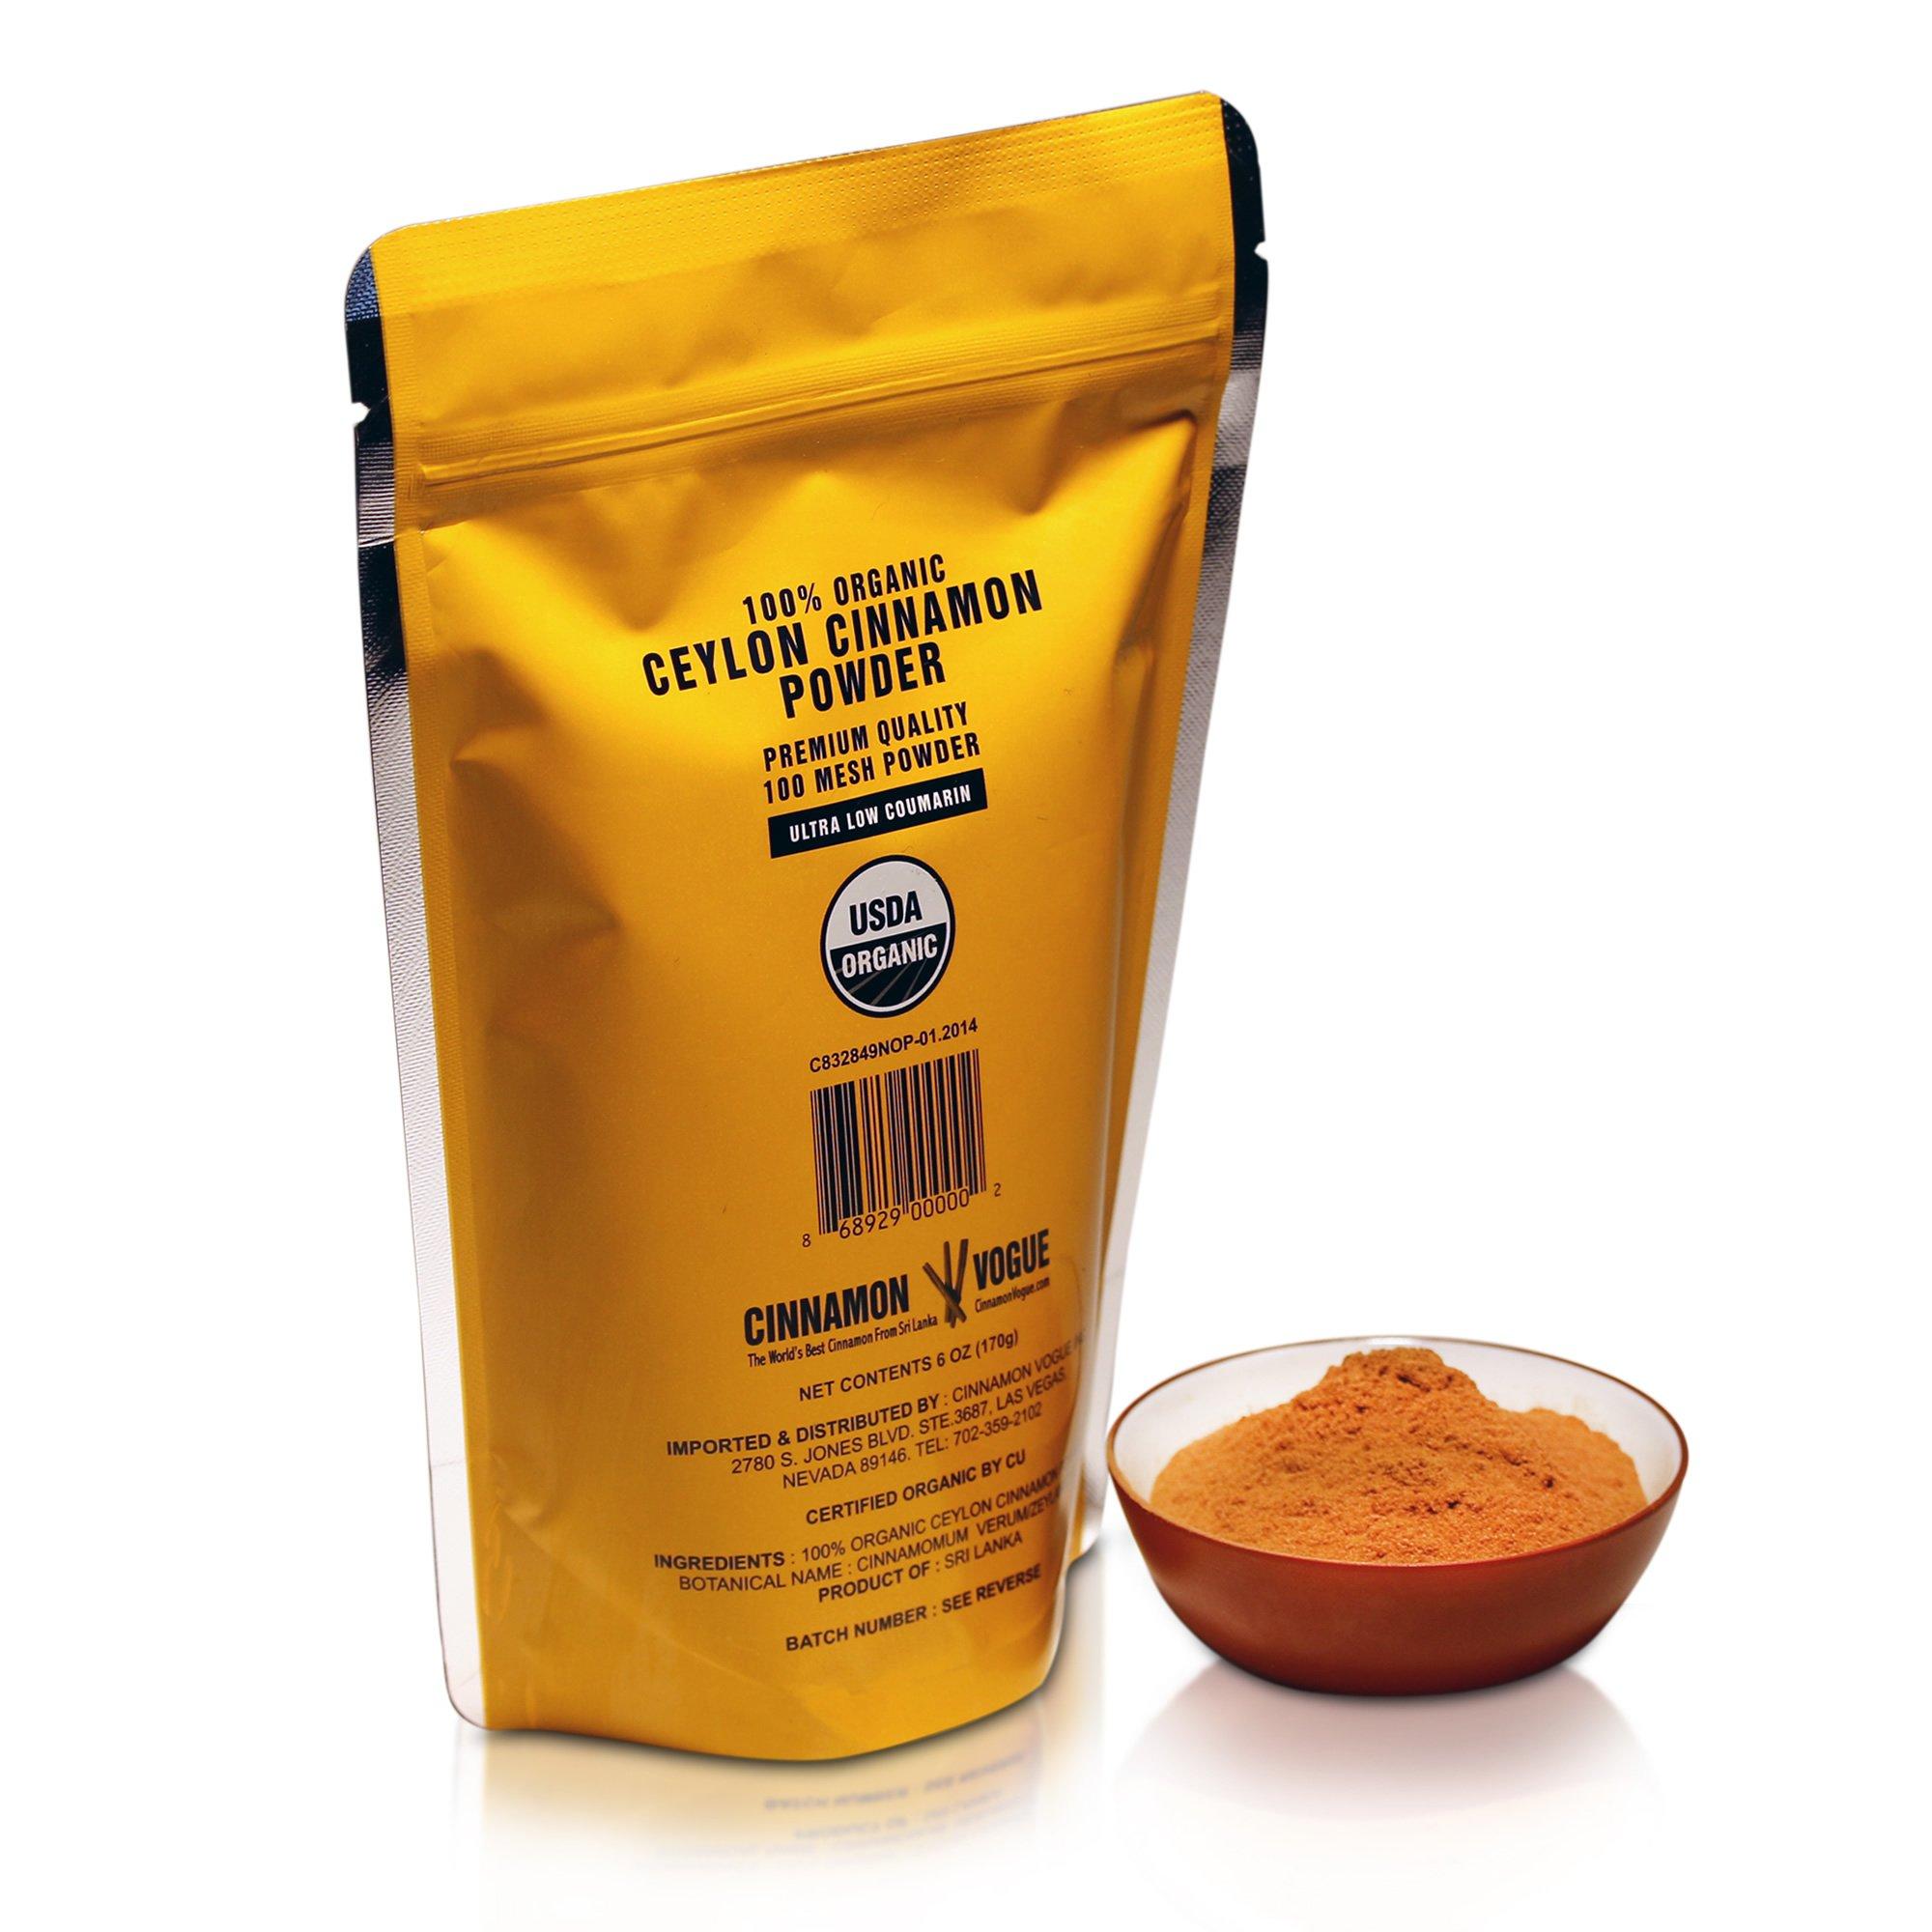 Ceylon Cinnamon Powder – 6 oz. (100% USDA Organic) - Ultra Premium Fine 100 Mesh Powder, Salt Free, Non irradiated, Low Coumarin by Cinnamon Vogue (Image #6)